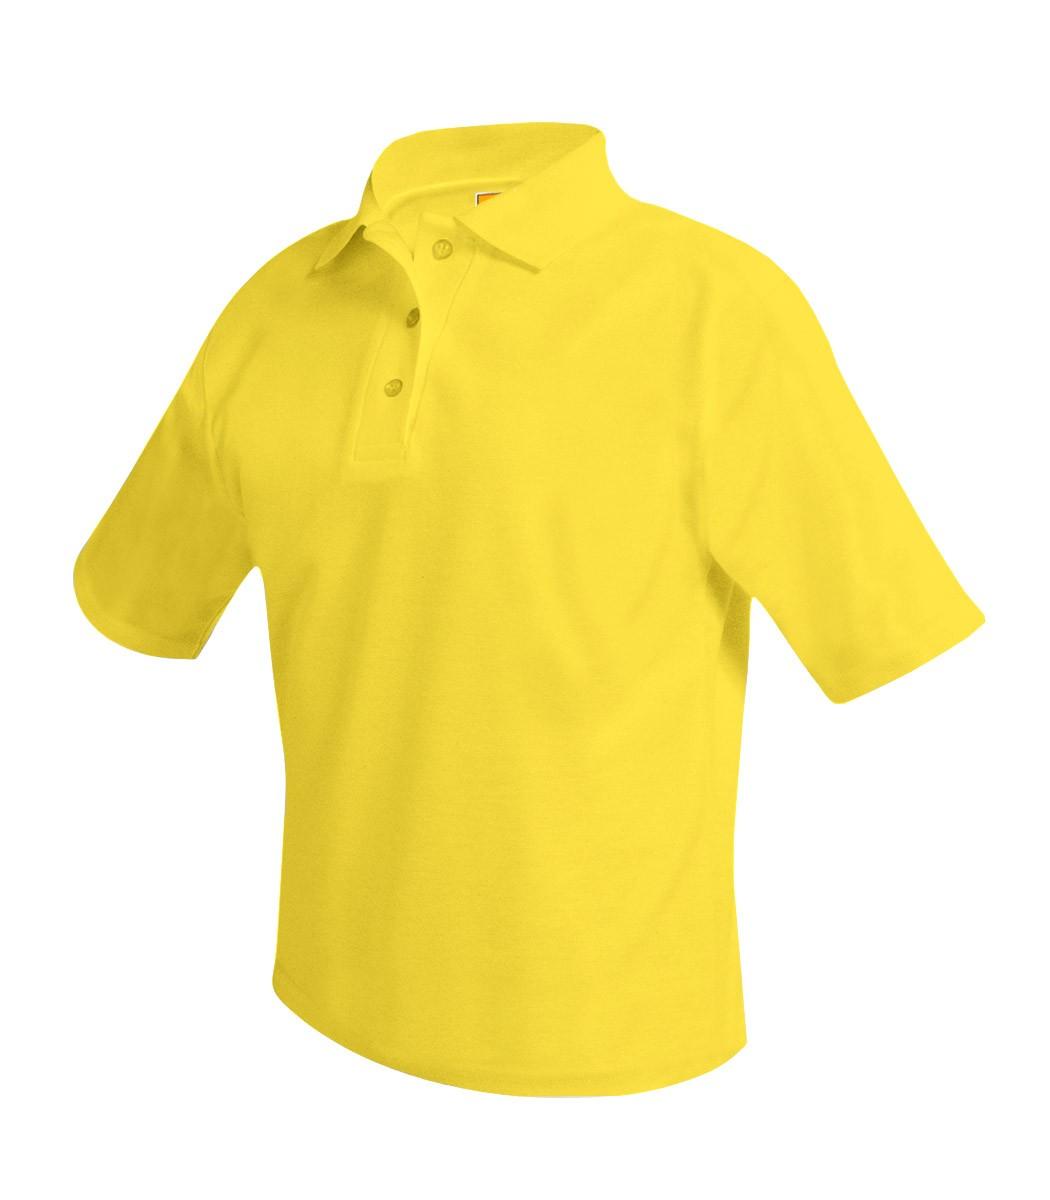 ANN Girls' Plain Yellow S/S Polo - Worn under Jumper Only